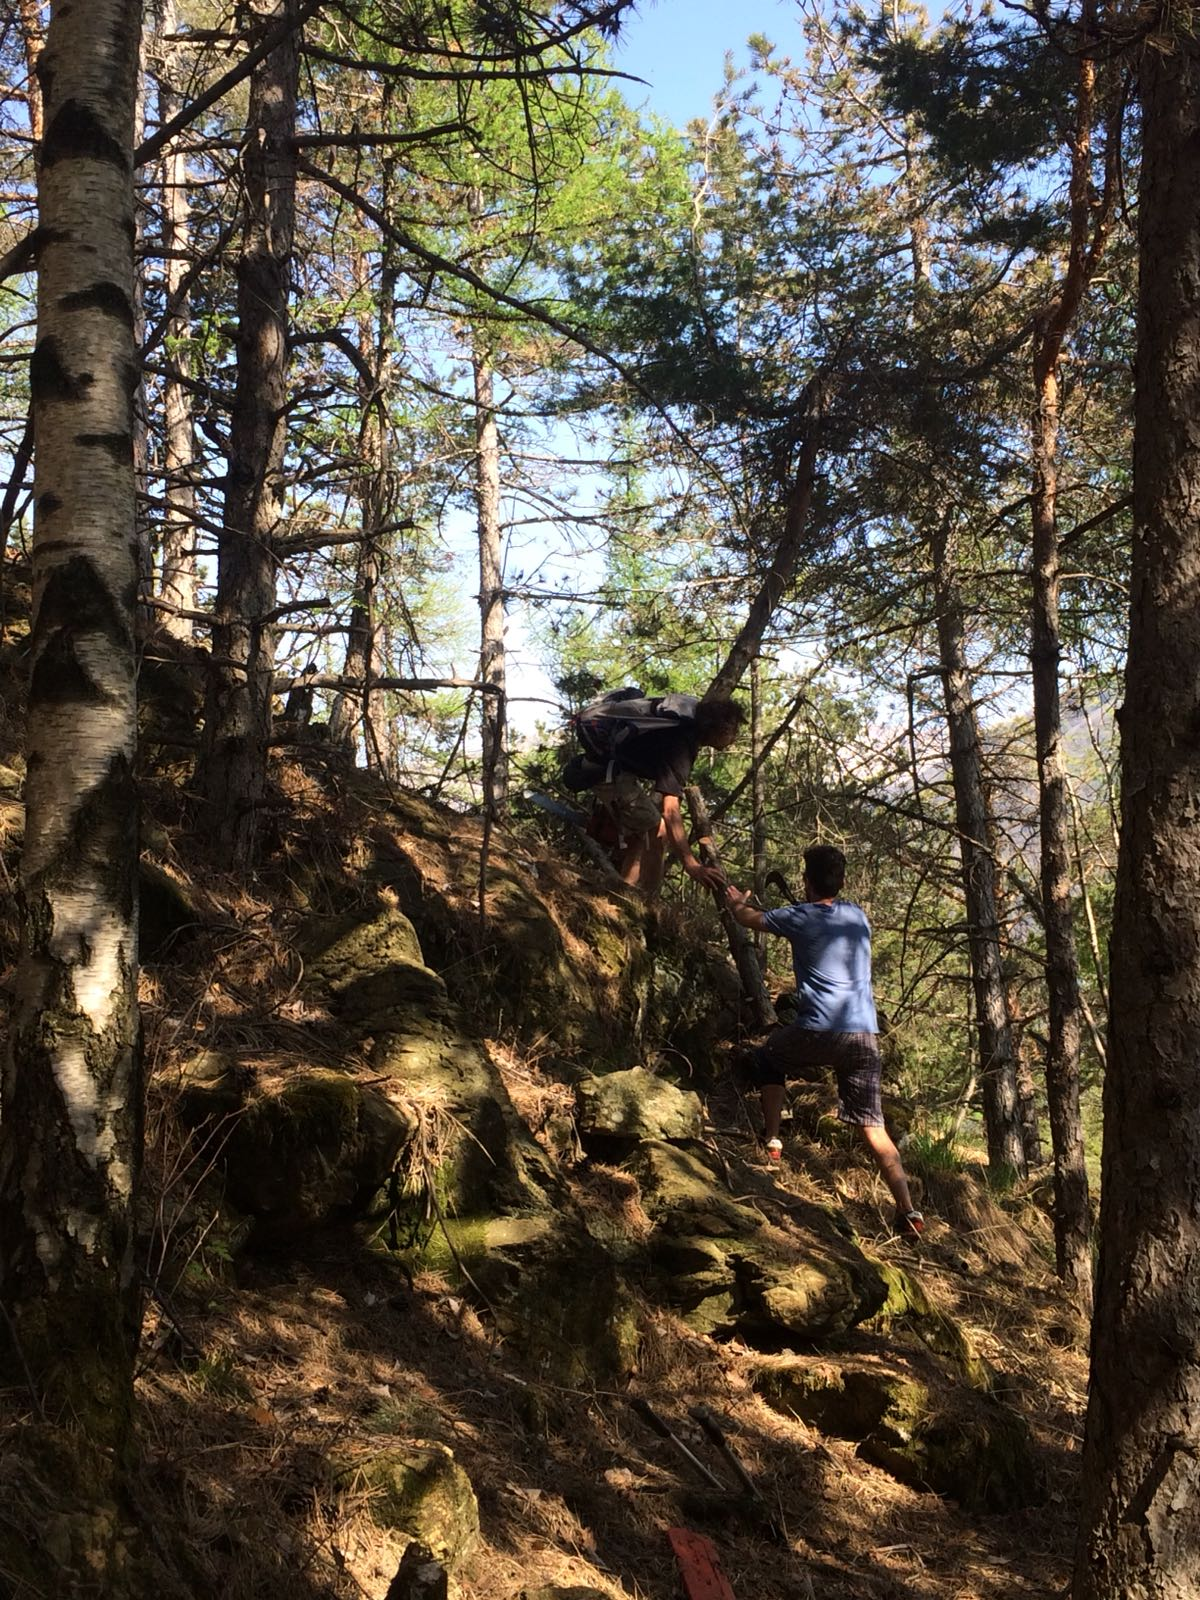 Fotoracconto pulizia sentiero Stabio - Ovairo e 352 22 aprile